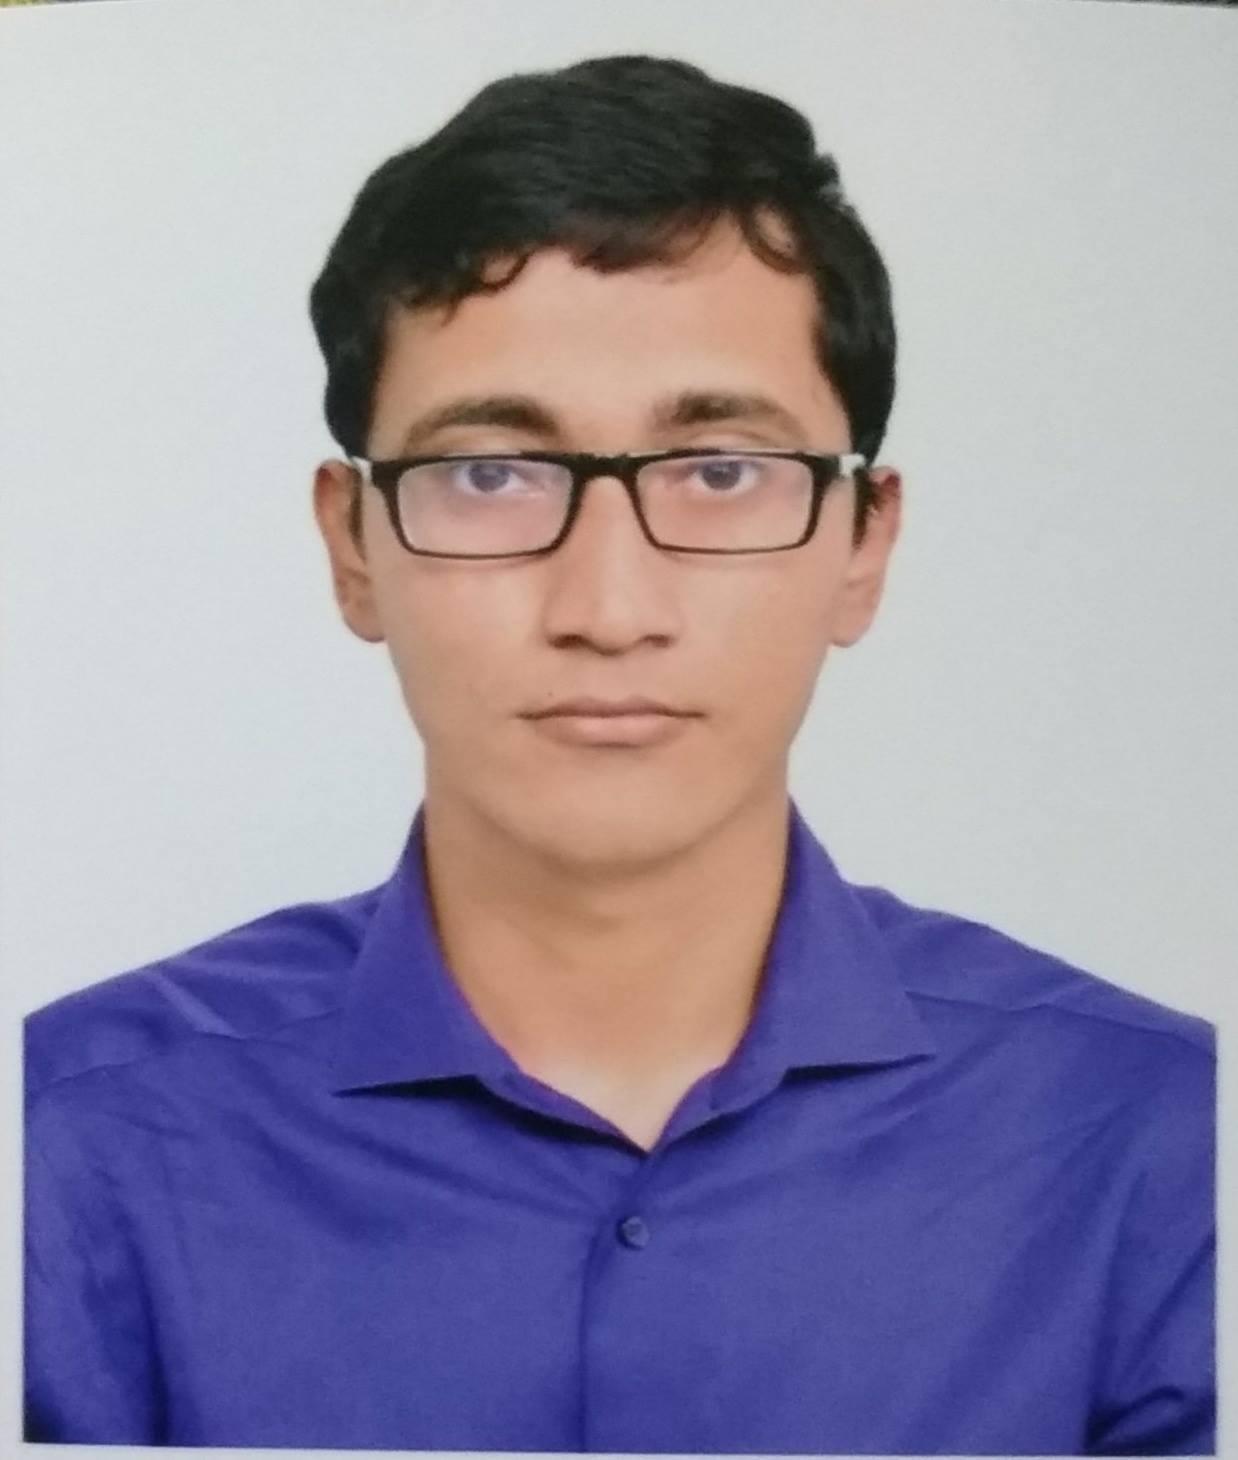 Kishan Kumar Ganguly